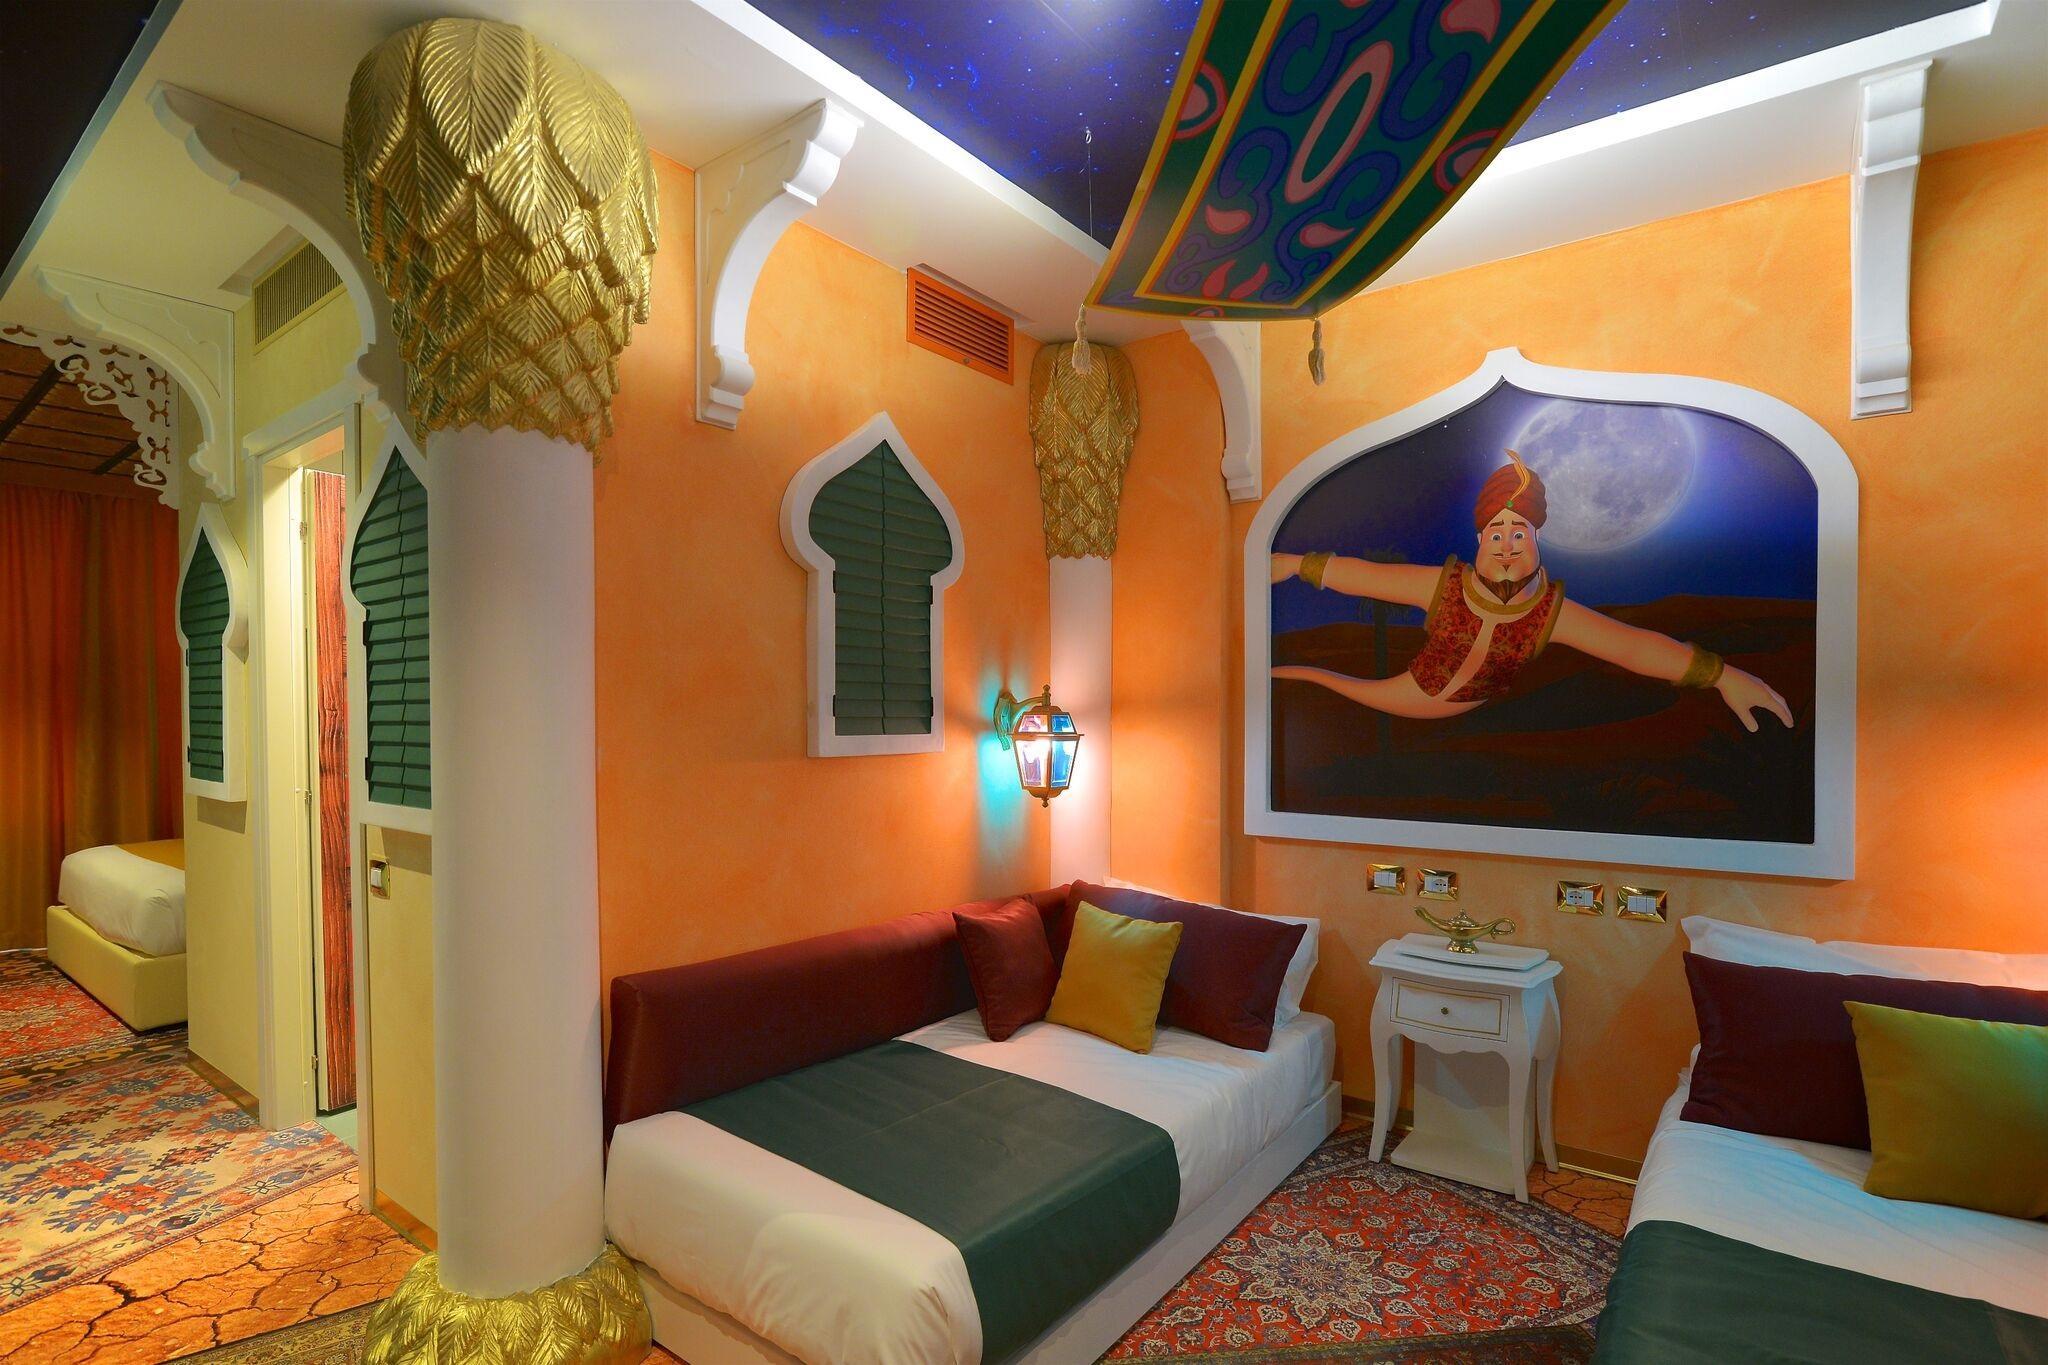 Camere Disneyland Hotel : Stanza igloo o western gardaland apre il primo hotel a tema